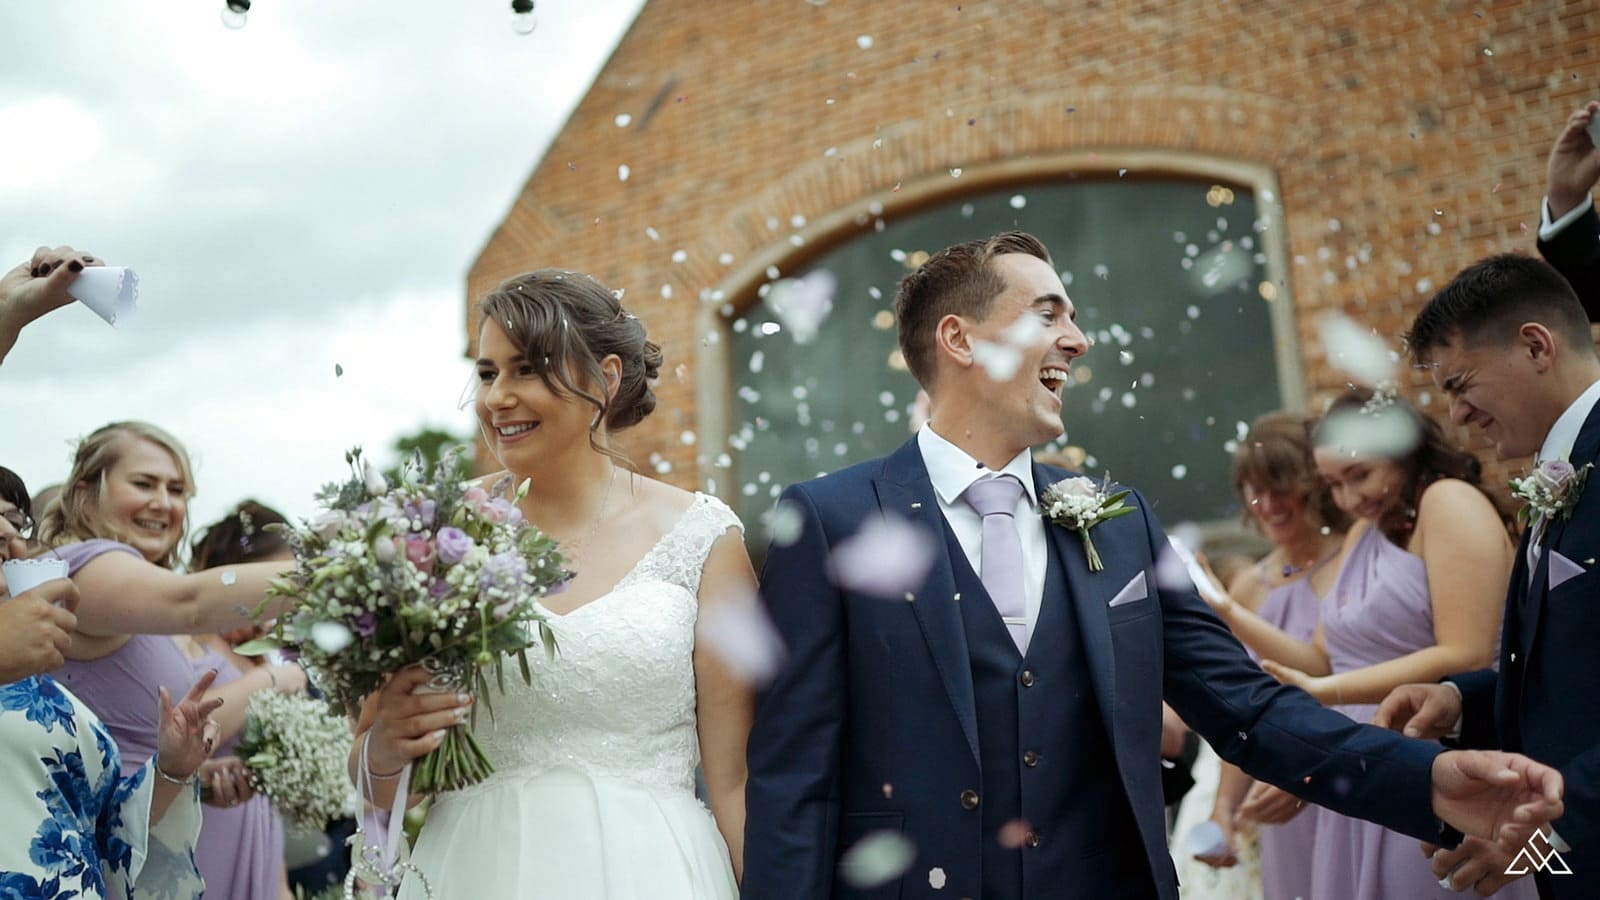 Southwood Hall Wedding Venue Outdoor Ceremony